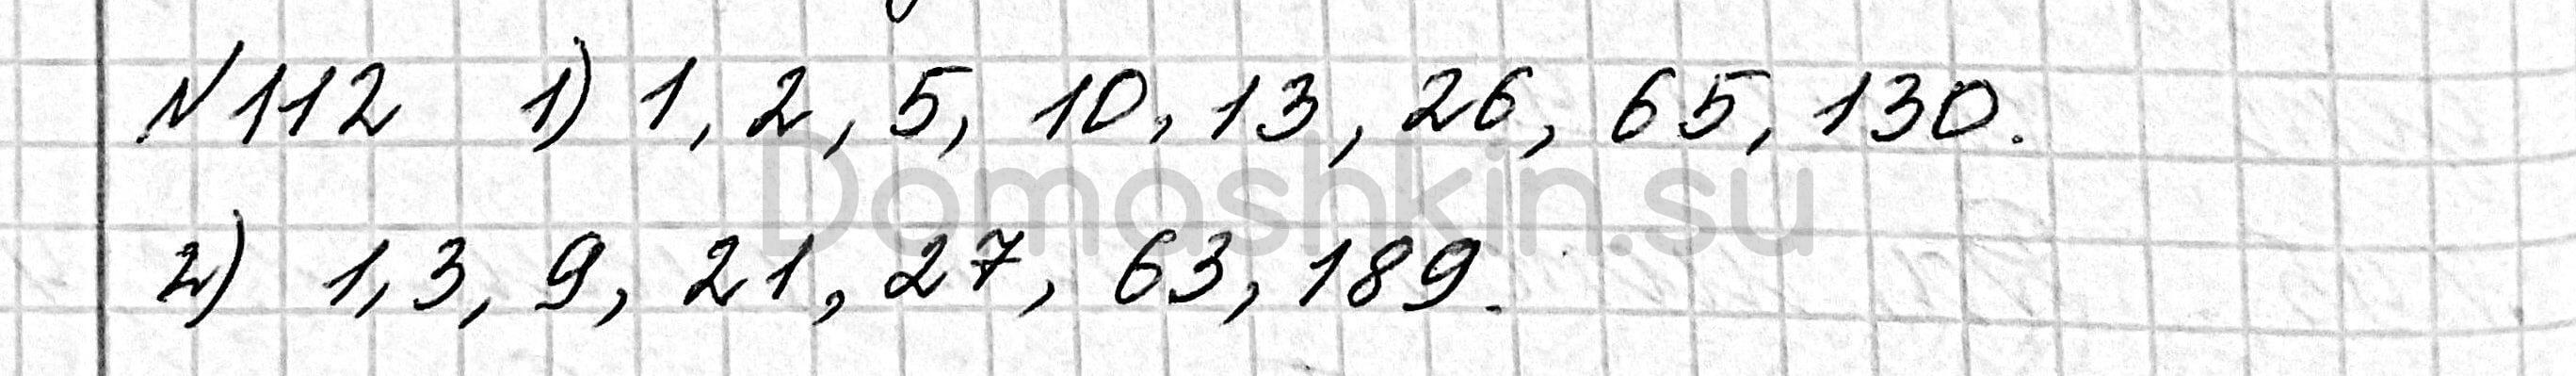 Математика 6 класс учебник Мерзляк номер 112 решение